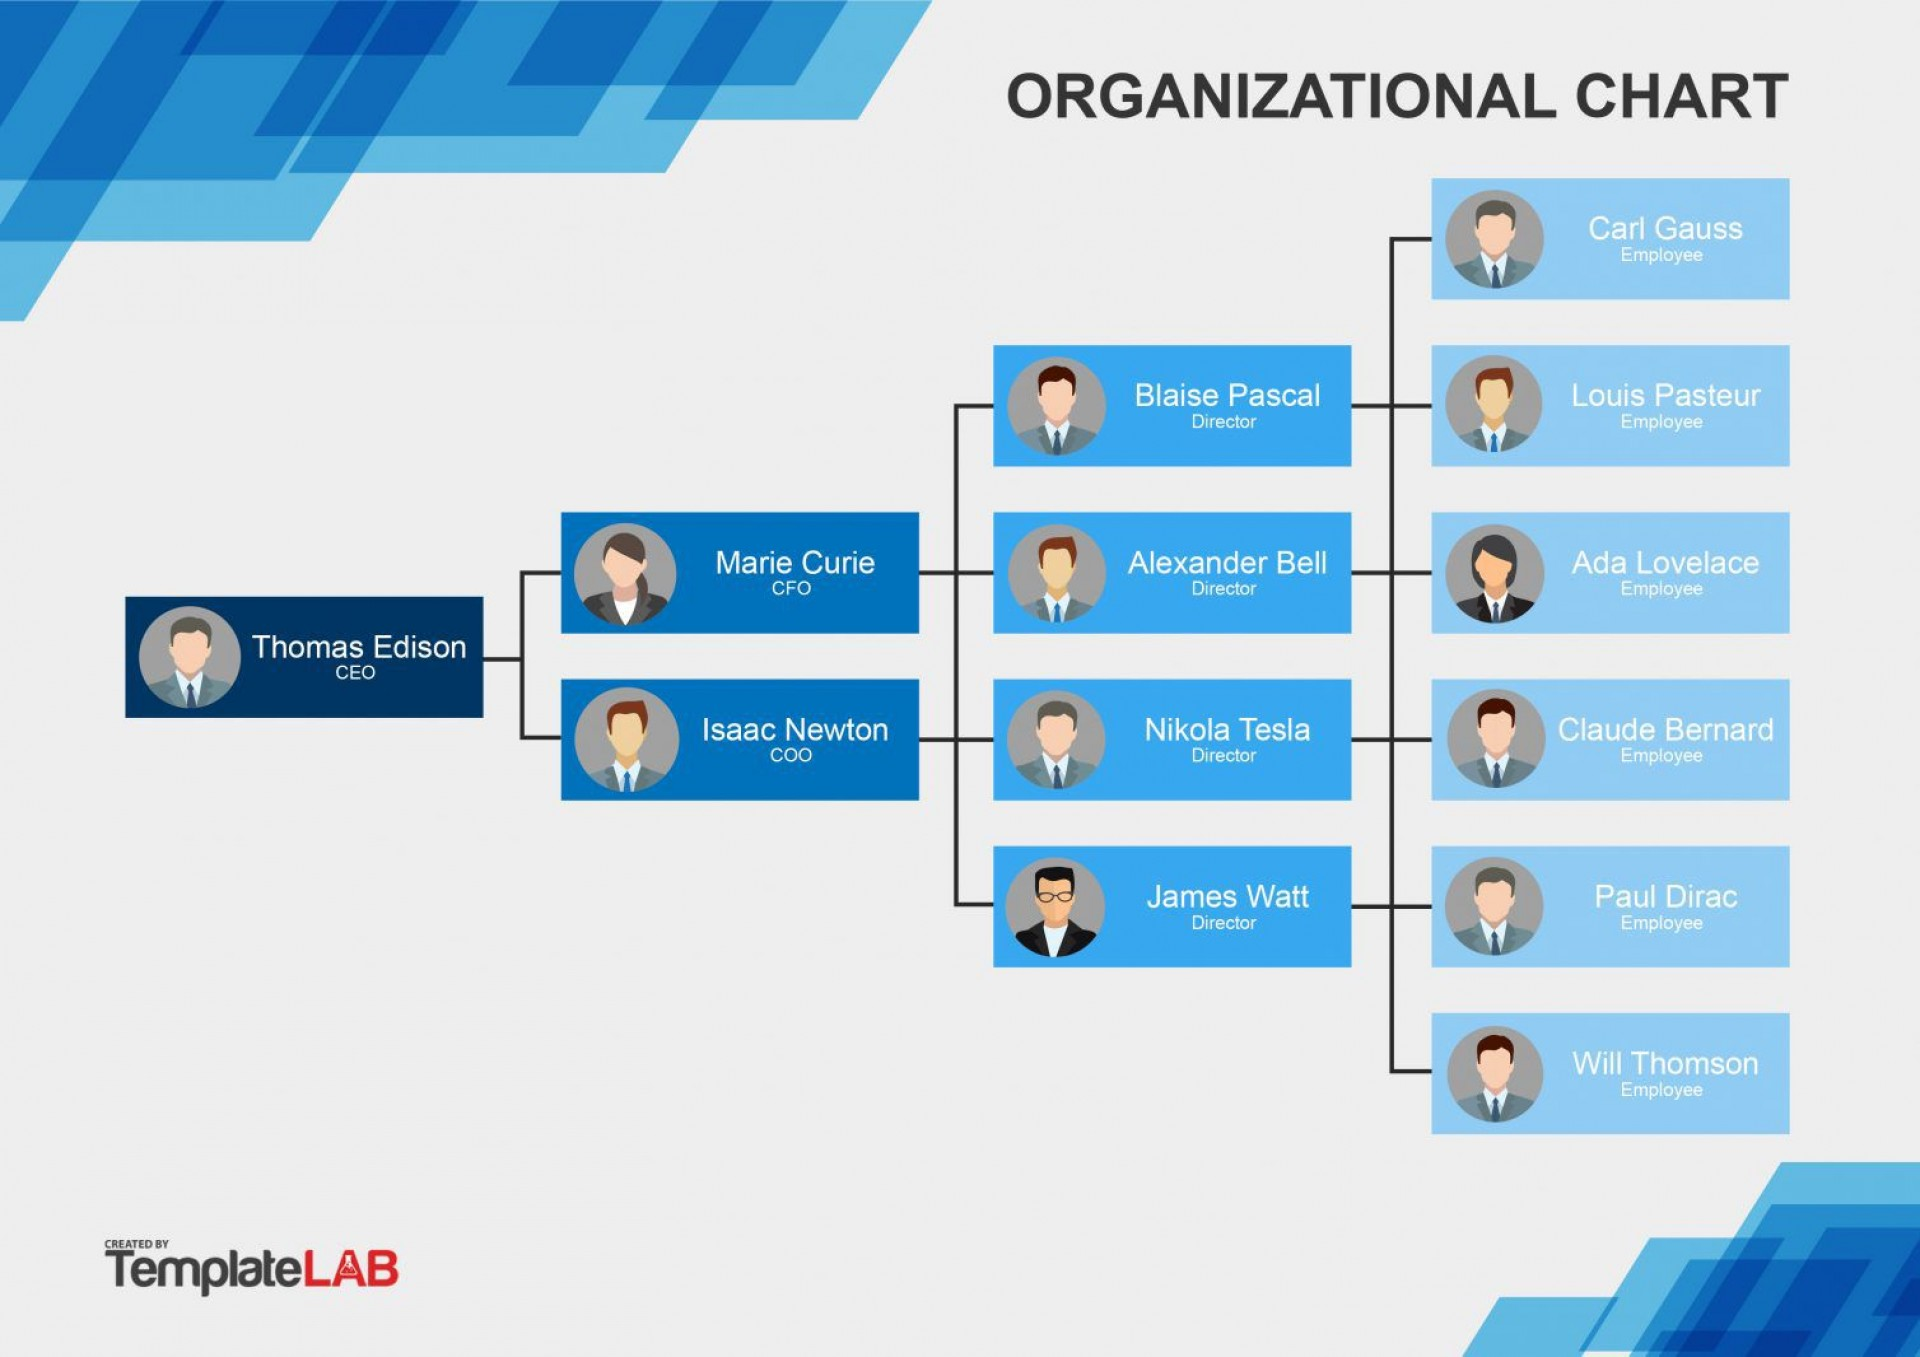 008 Wondrou Org Chart Template Powerpoint Example  Free Organization Download Organizational 20101920